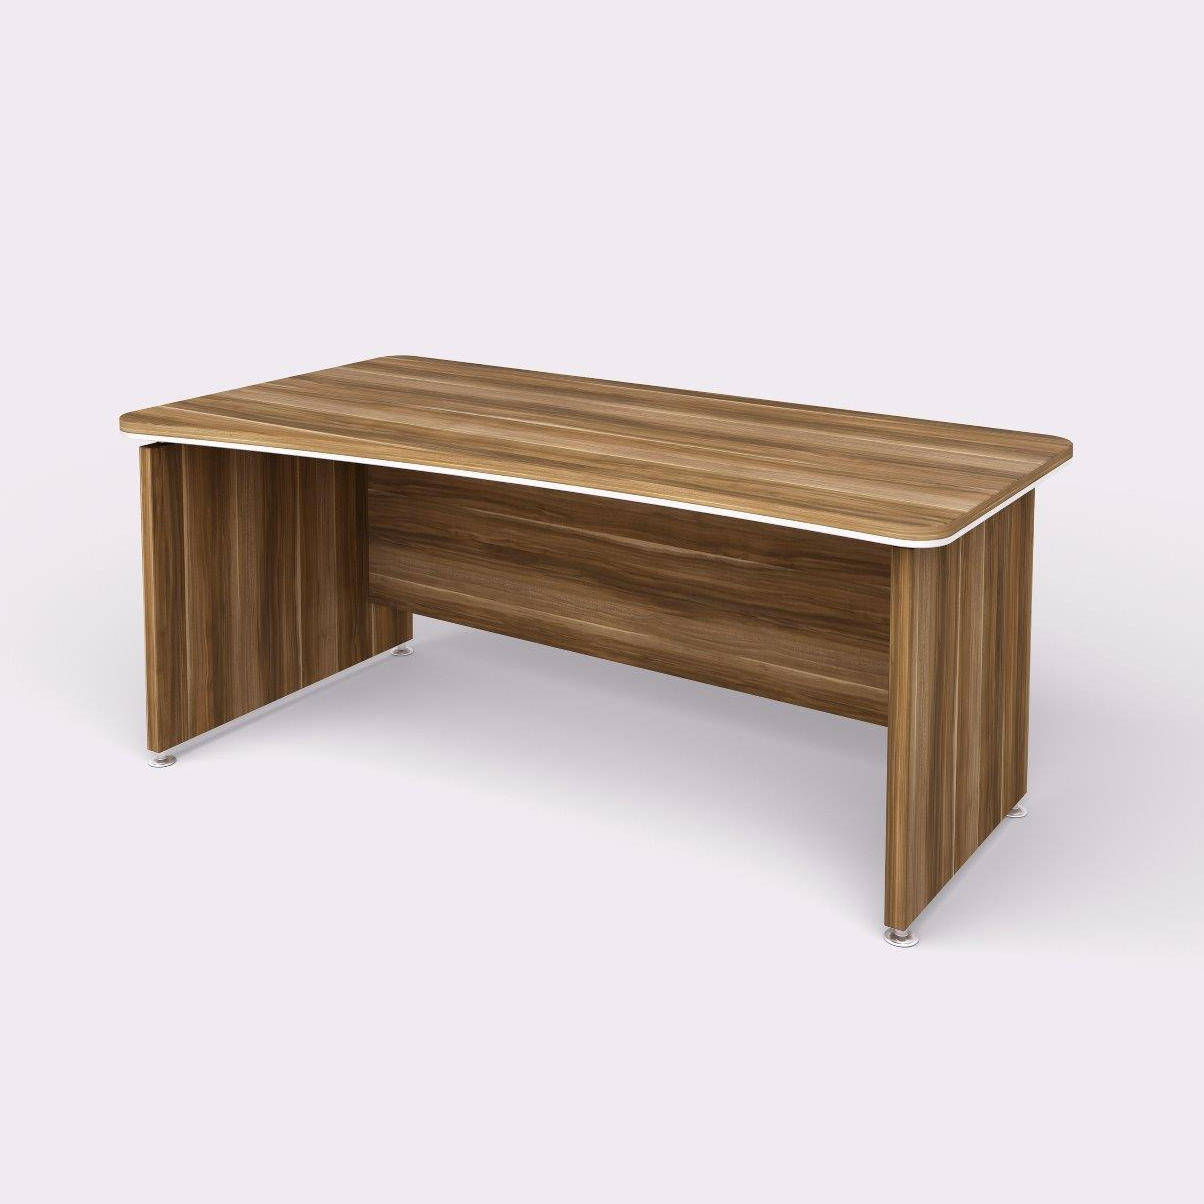 Lenza Kancelářský stůl Wels 180 cm levá varianta